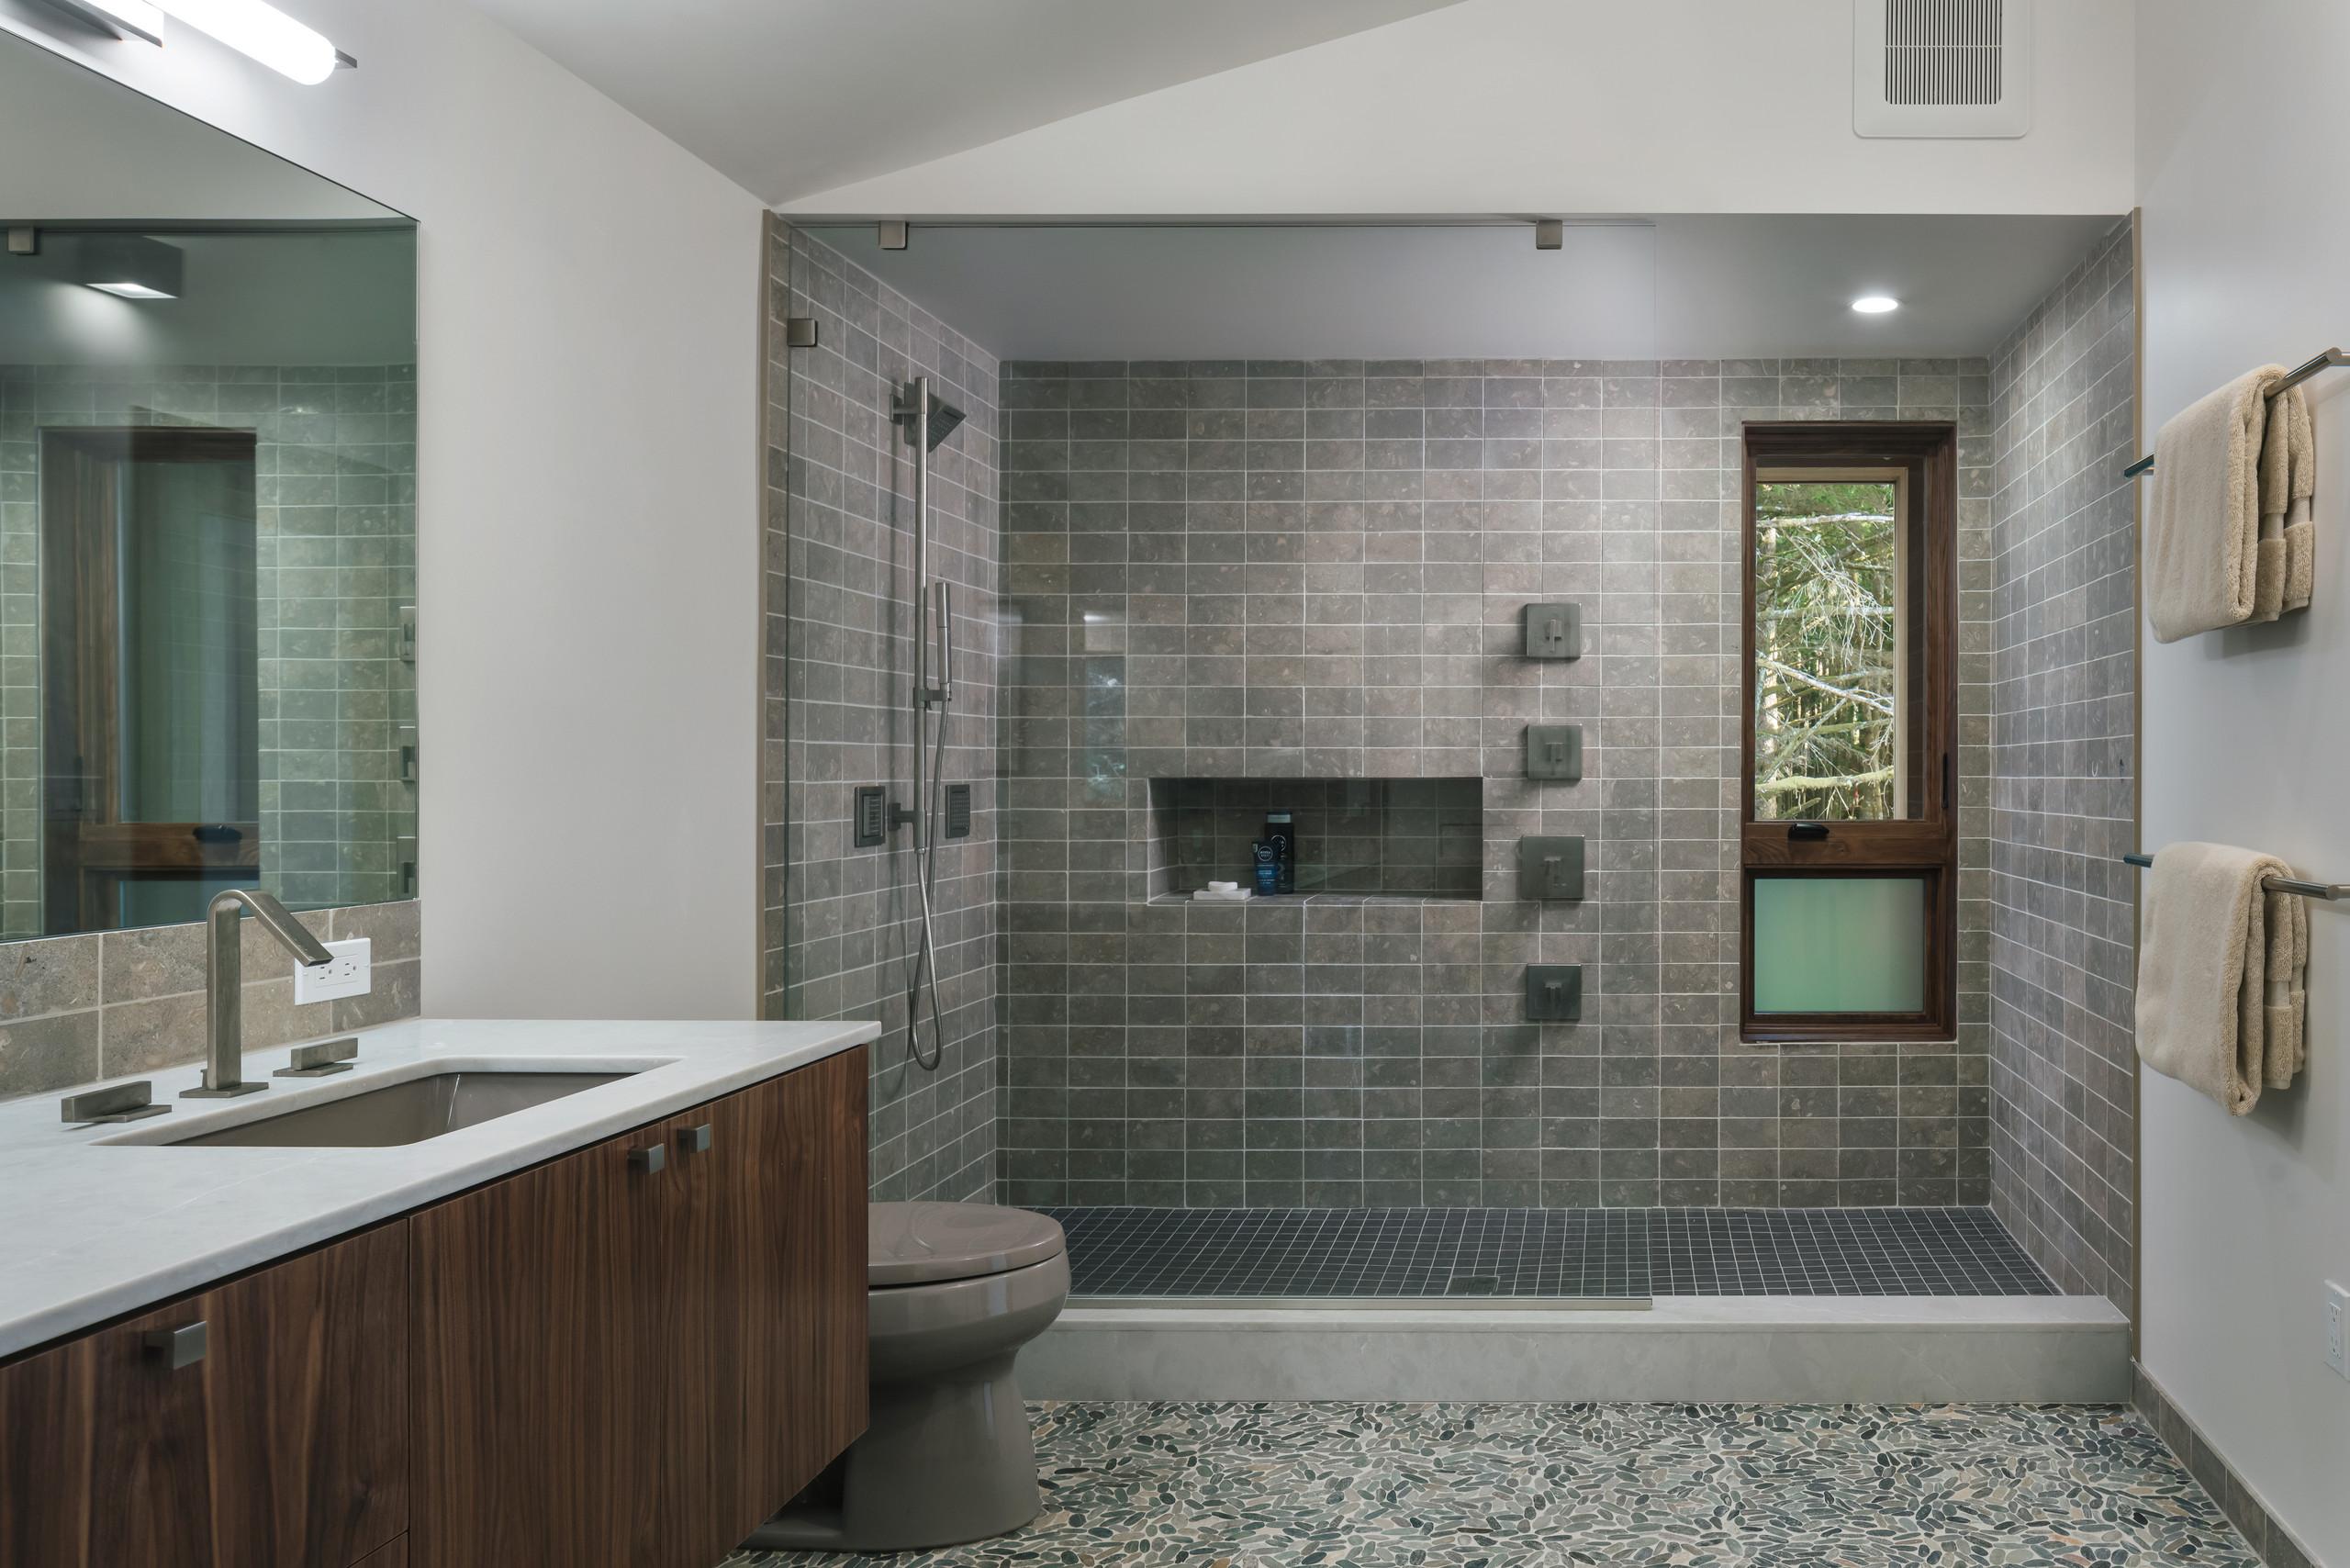 75 Beautiful Pebble Tile Floor Bathroom